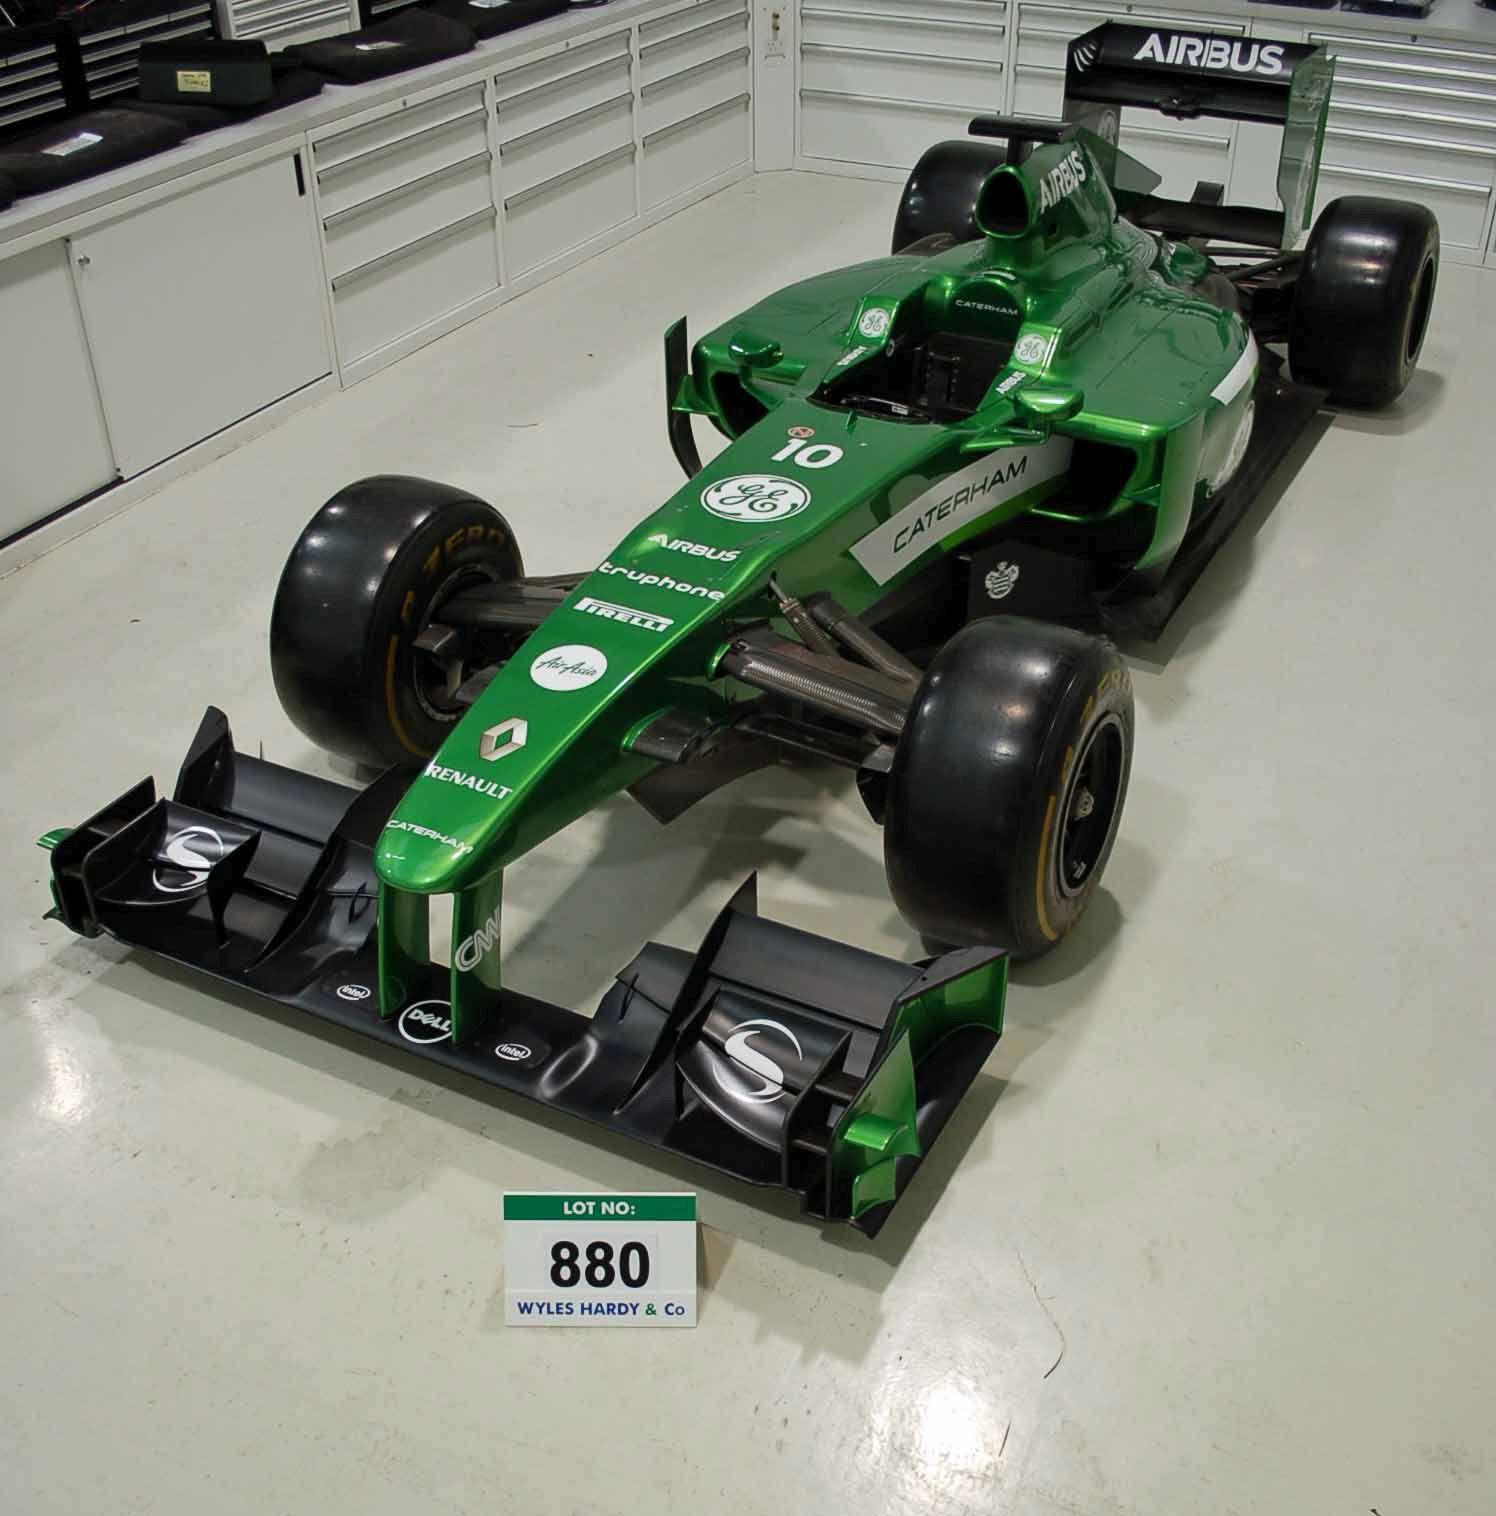 A Lotus Racing Formula 1 Full Racing Chassis Show Car